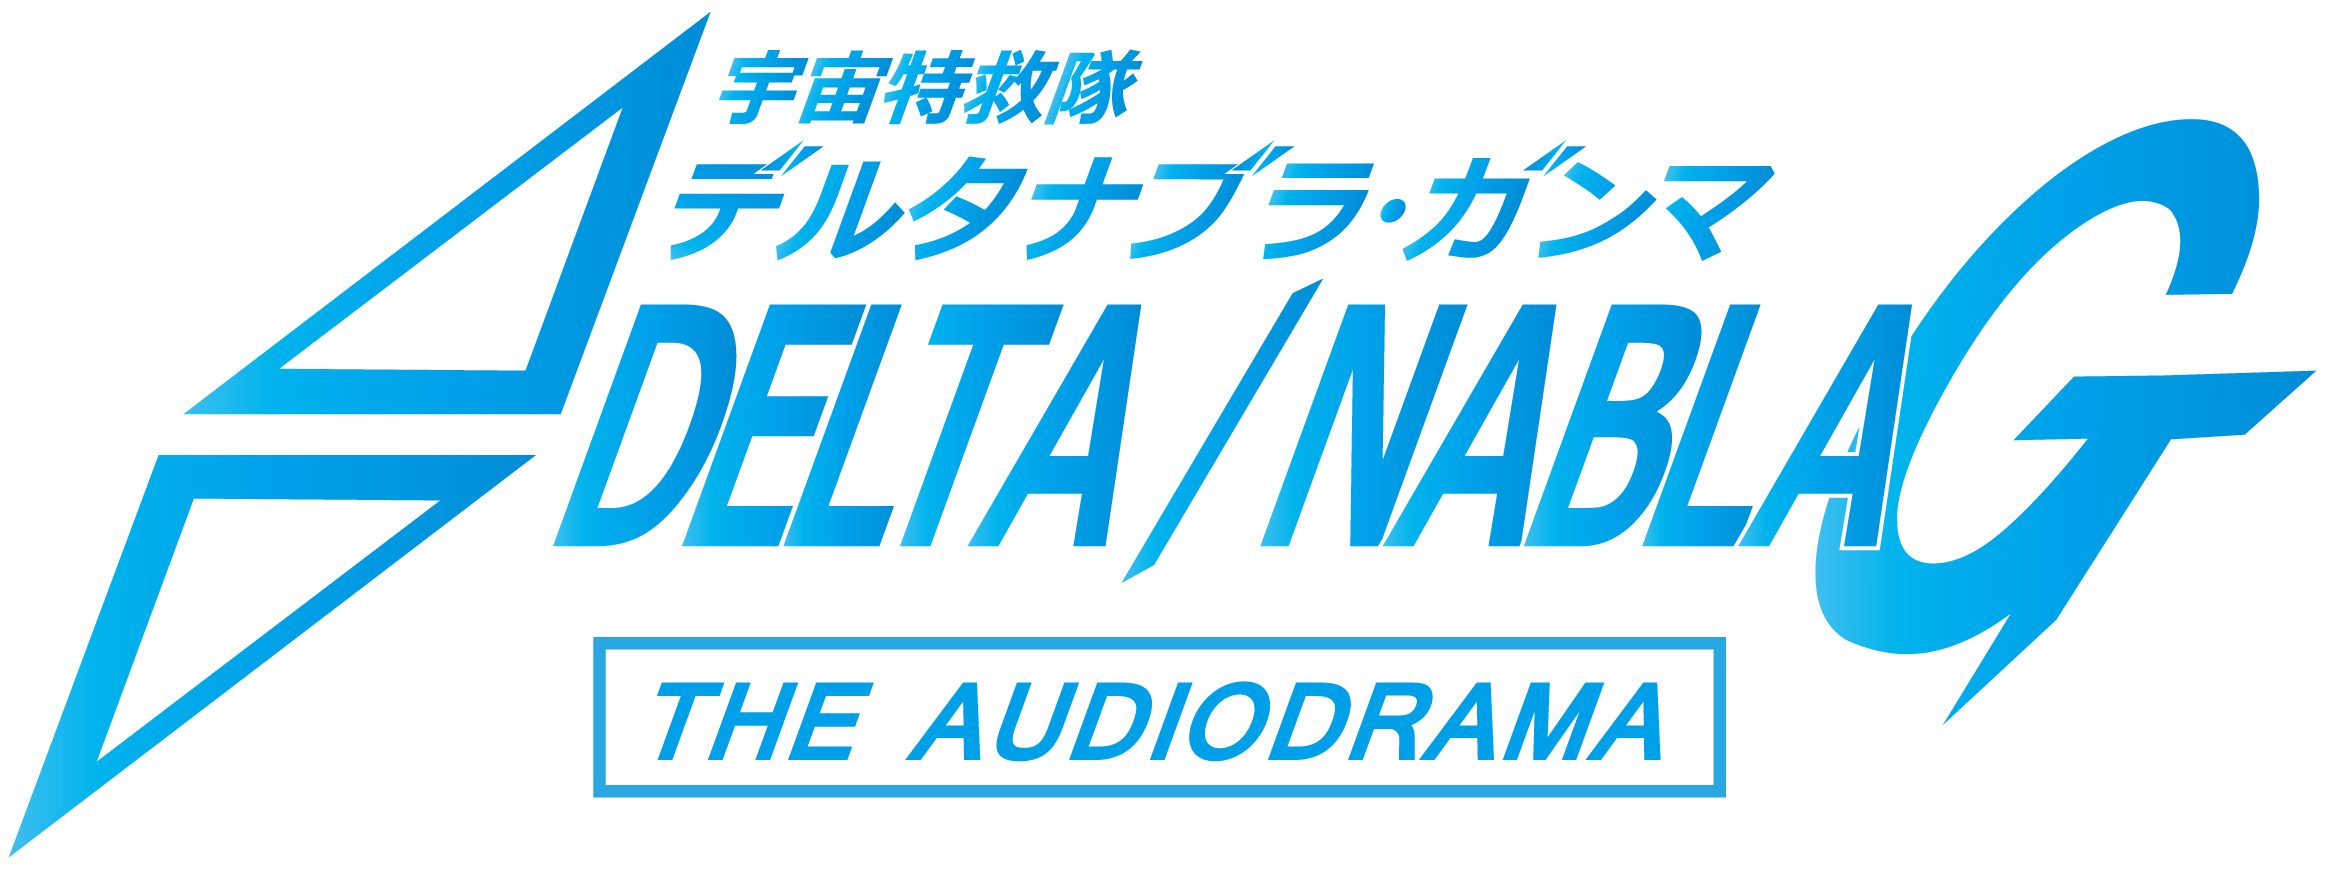 DELTA NABLA G logo no-c